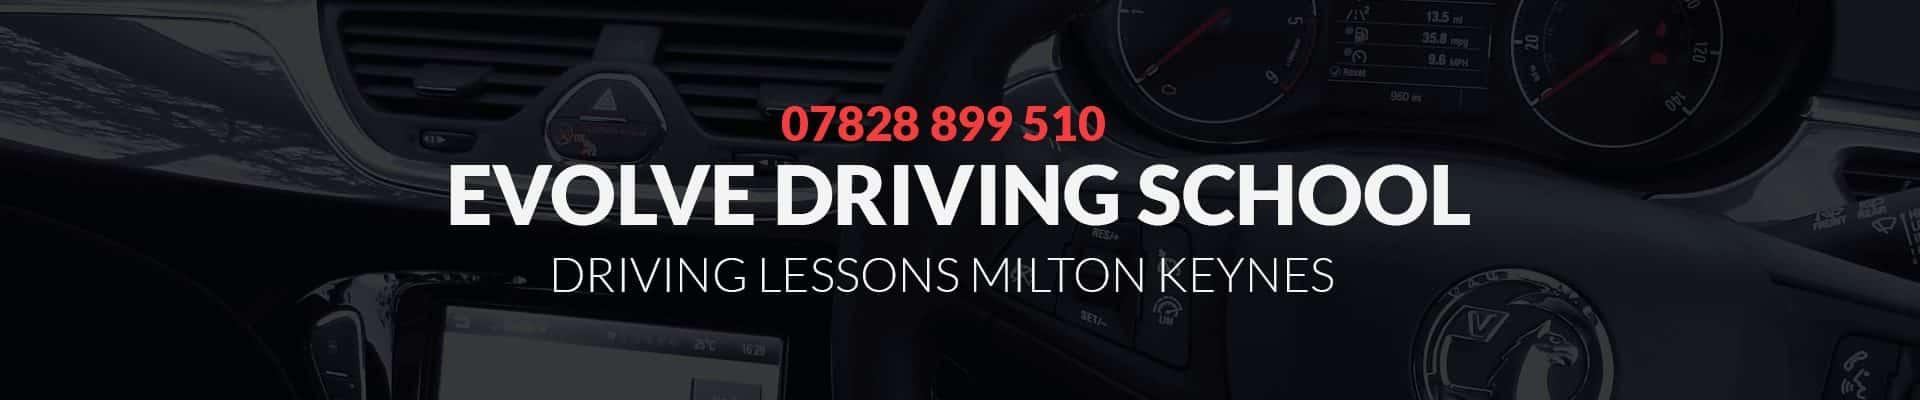 milton keynes driving lessons help banner